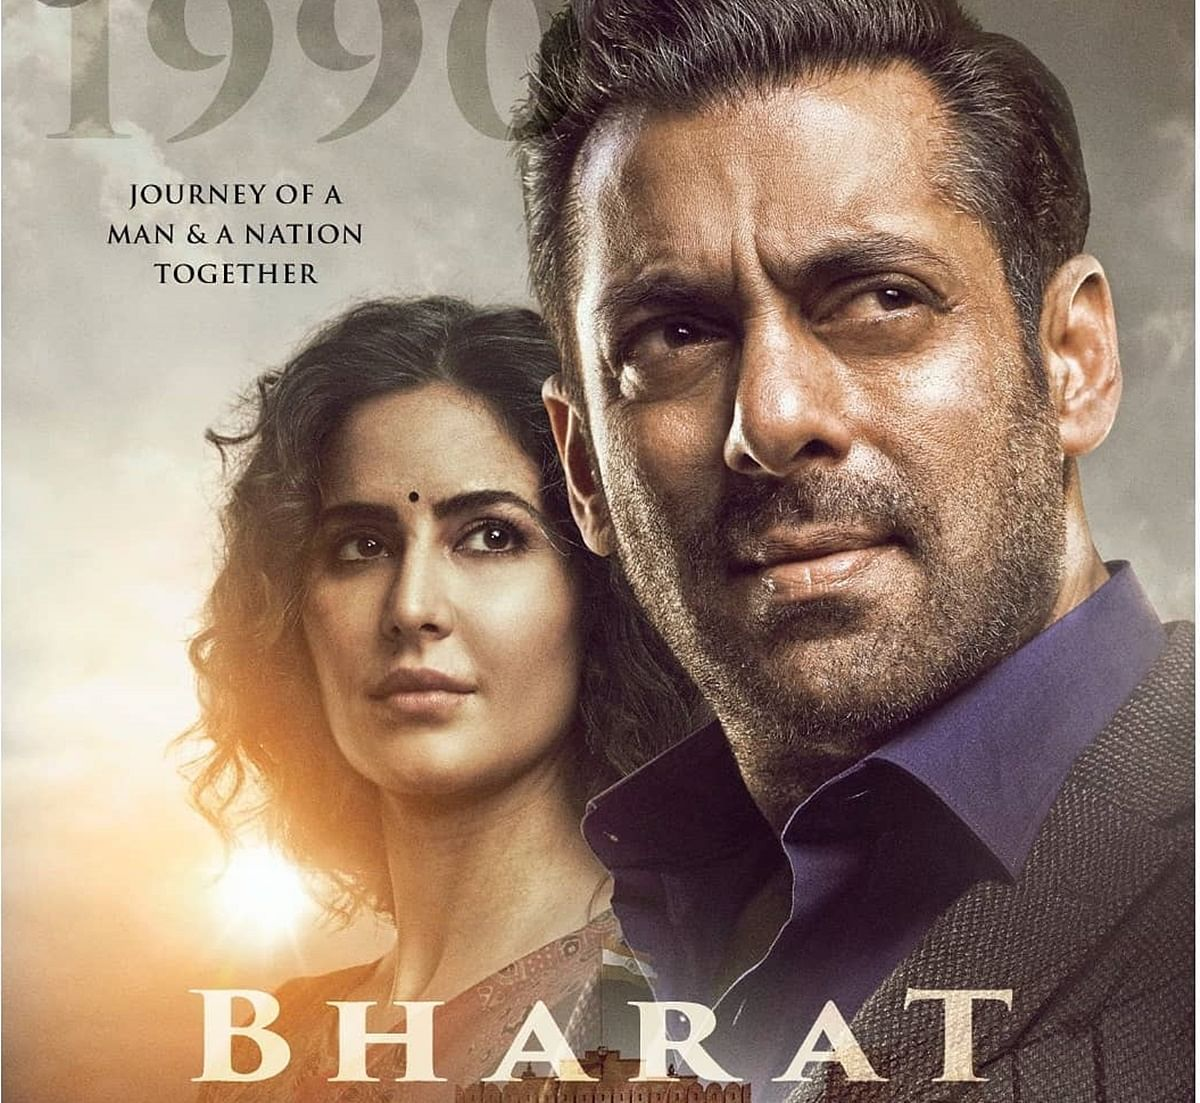 Bharat Full Movie Leaked Online in HD Quality: Salman Khan starrer will still rule the box office